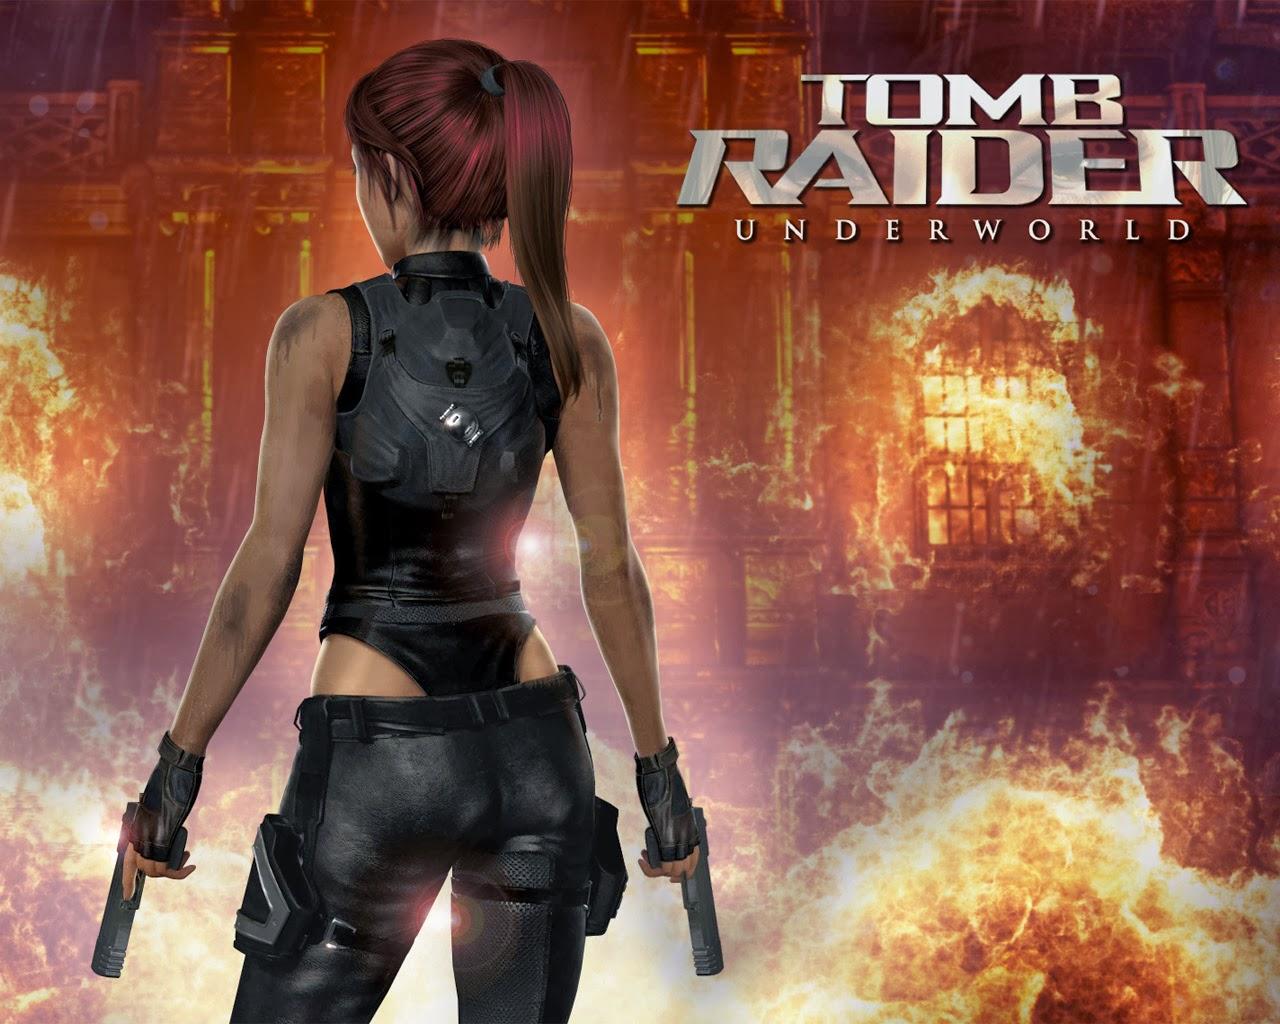 Tomb raider underworld patch porn picture